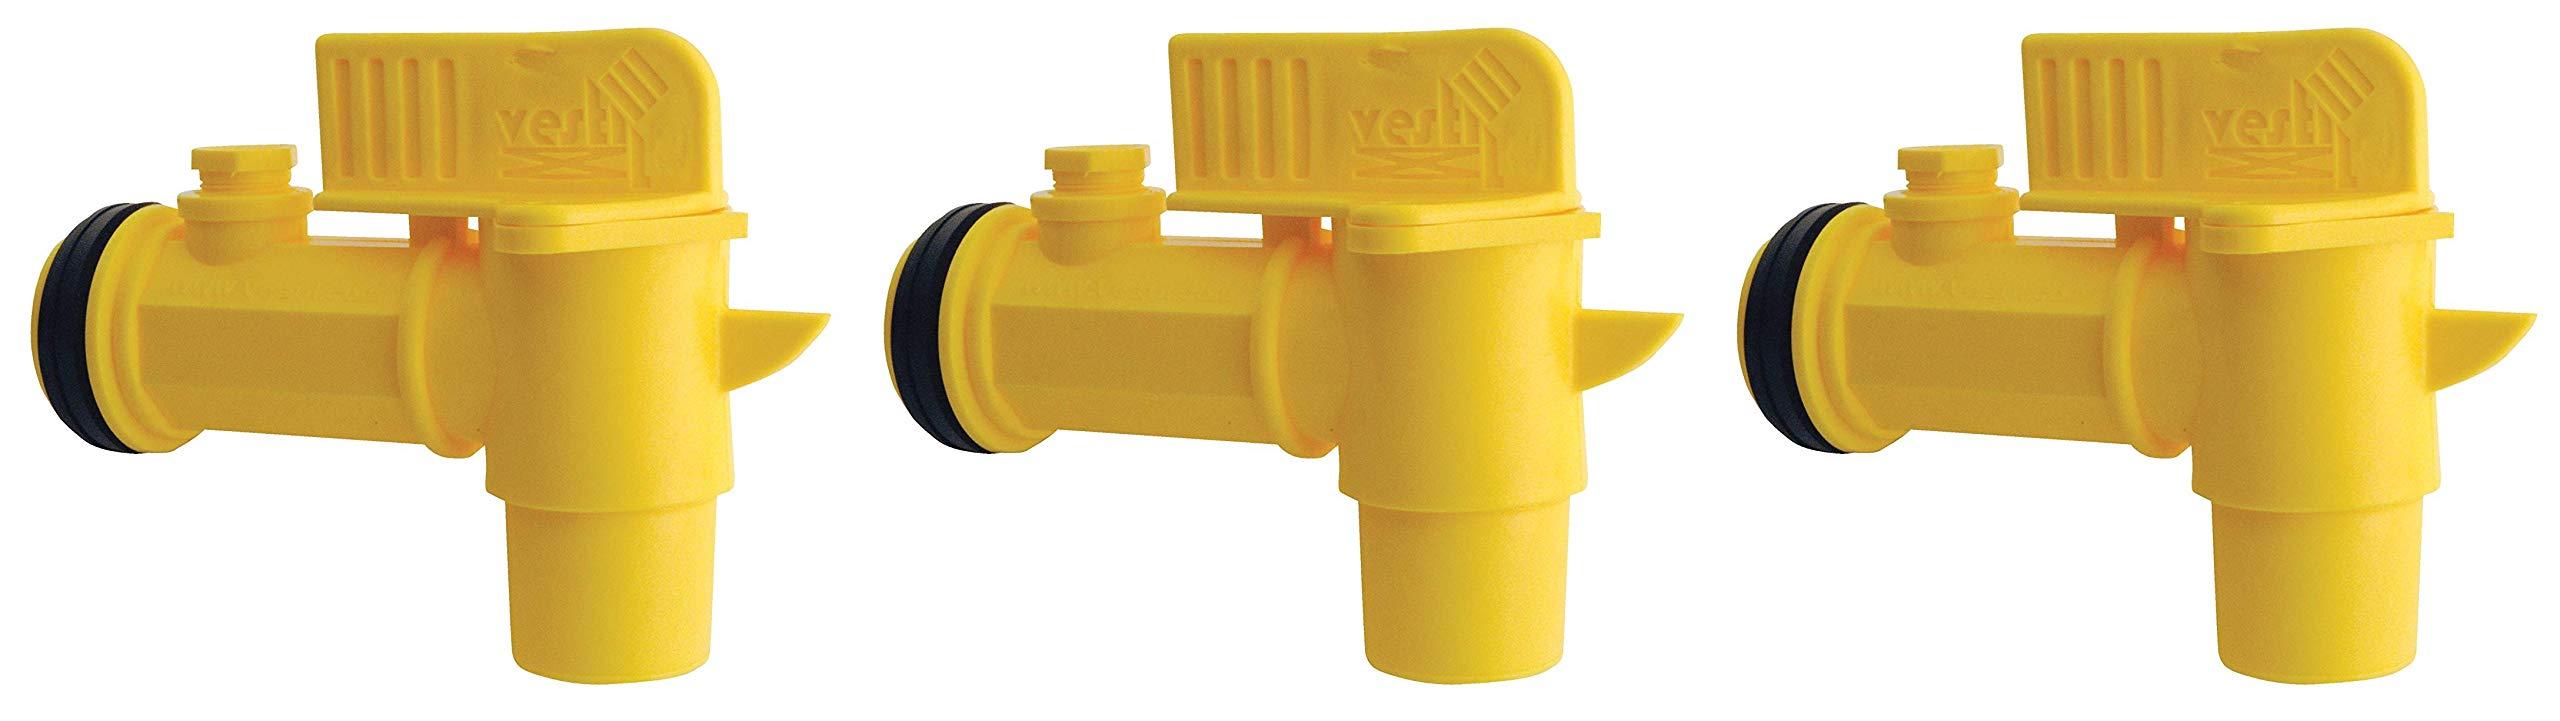 Vestil JDFT Plastic Manual Handle Jumbo Drum Faucet, Fits 2'' Drum Openings (Тhrее Pаck, Yellow)